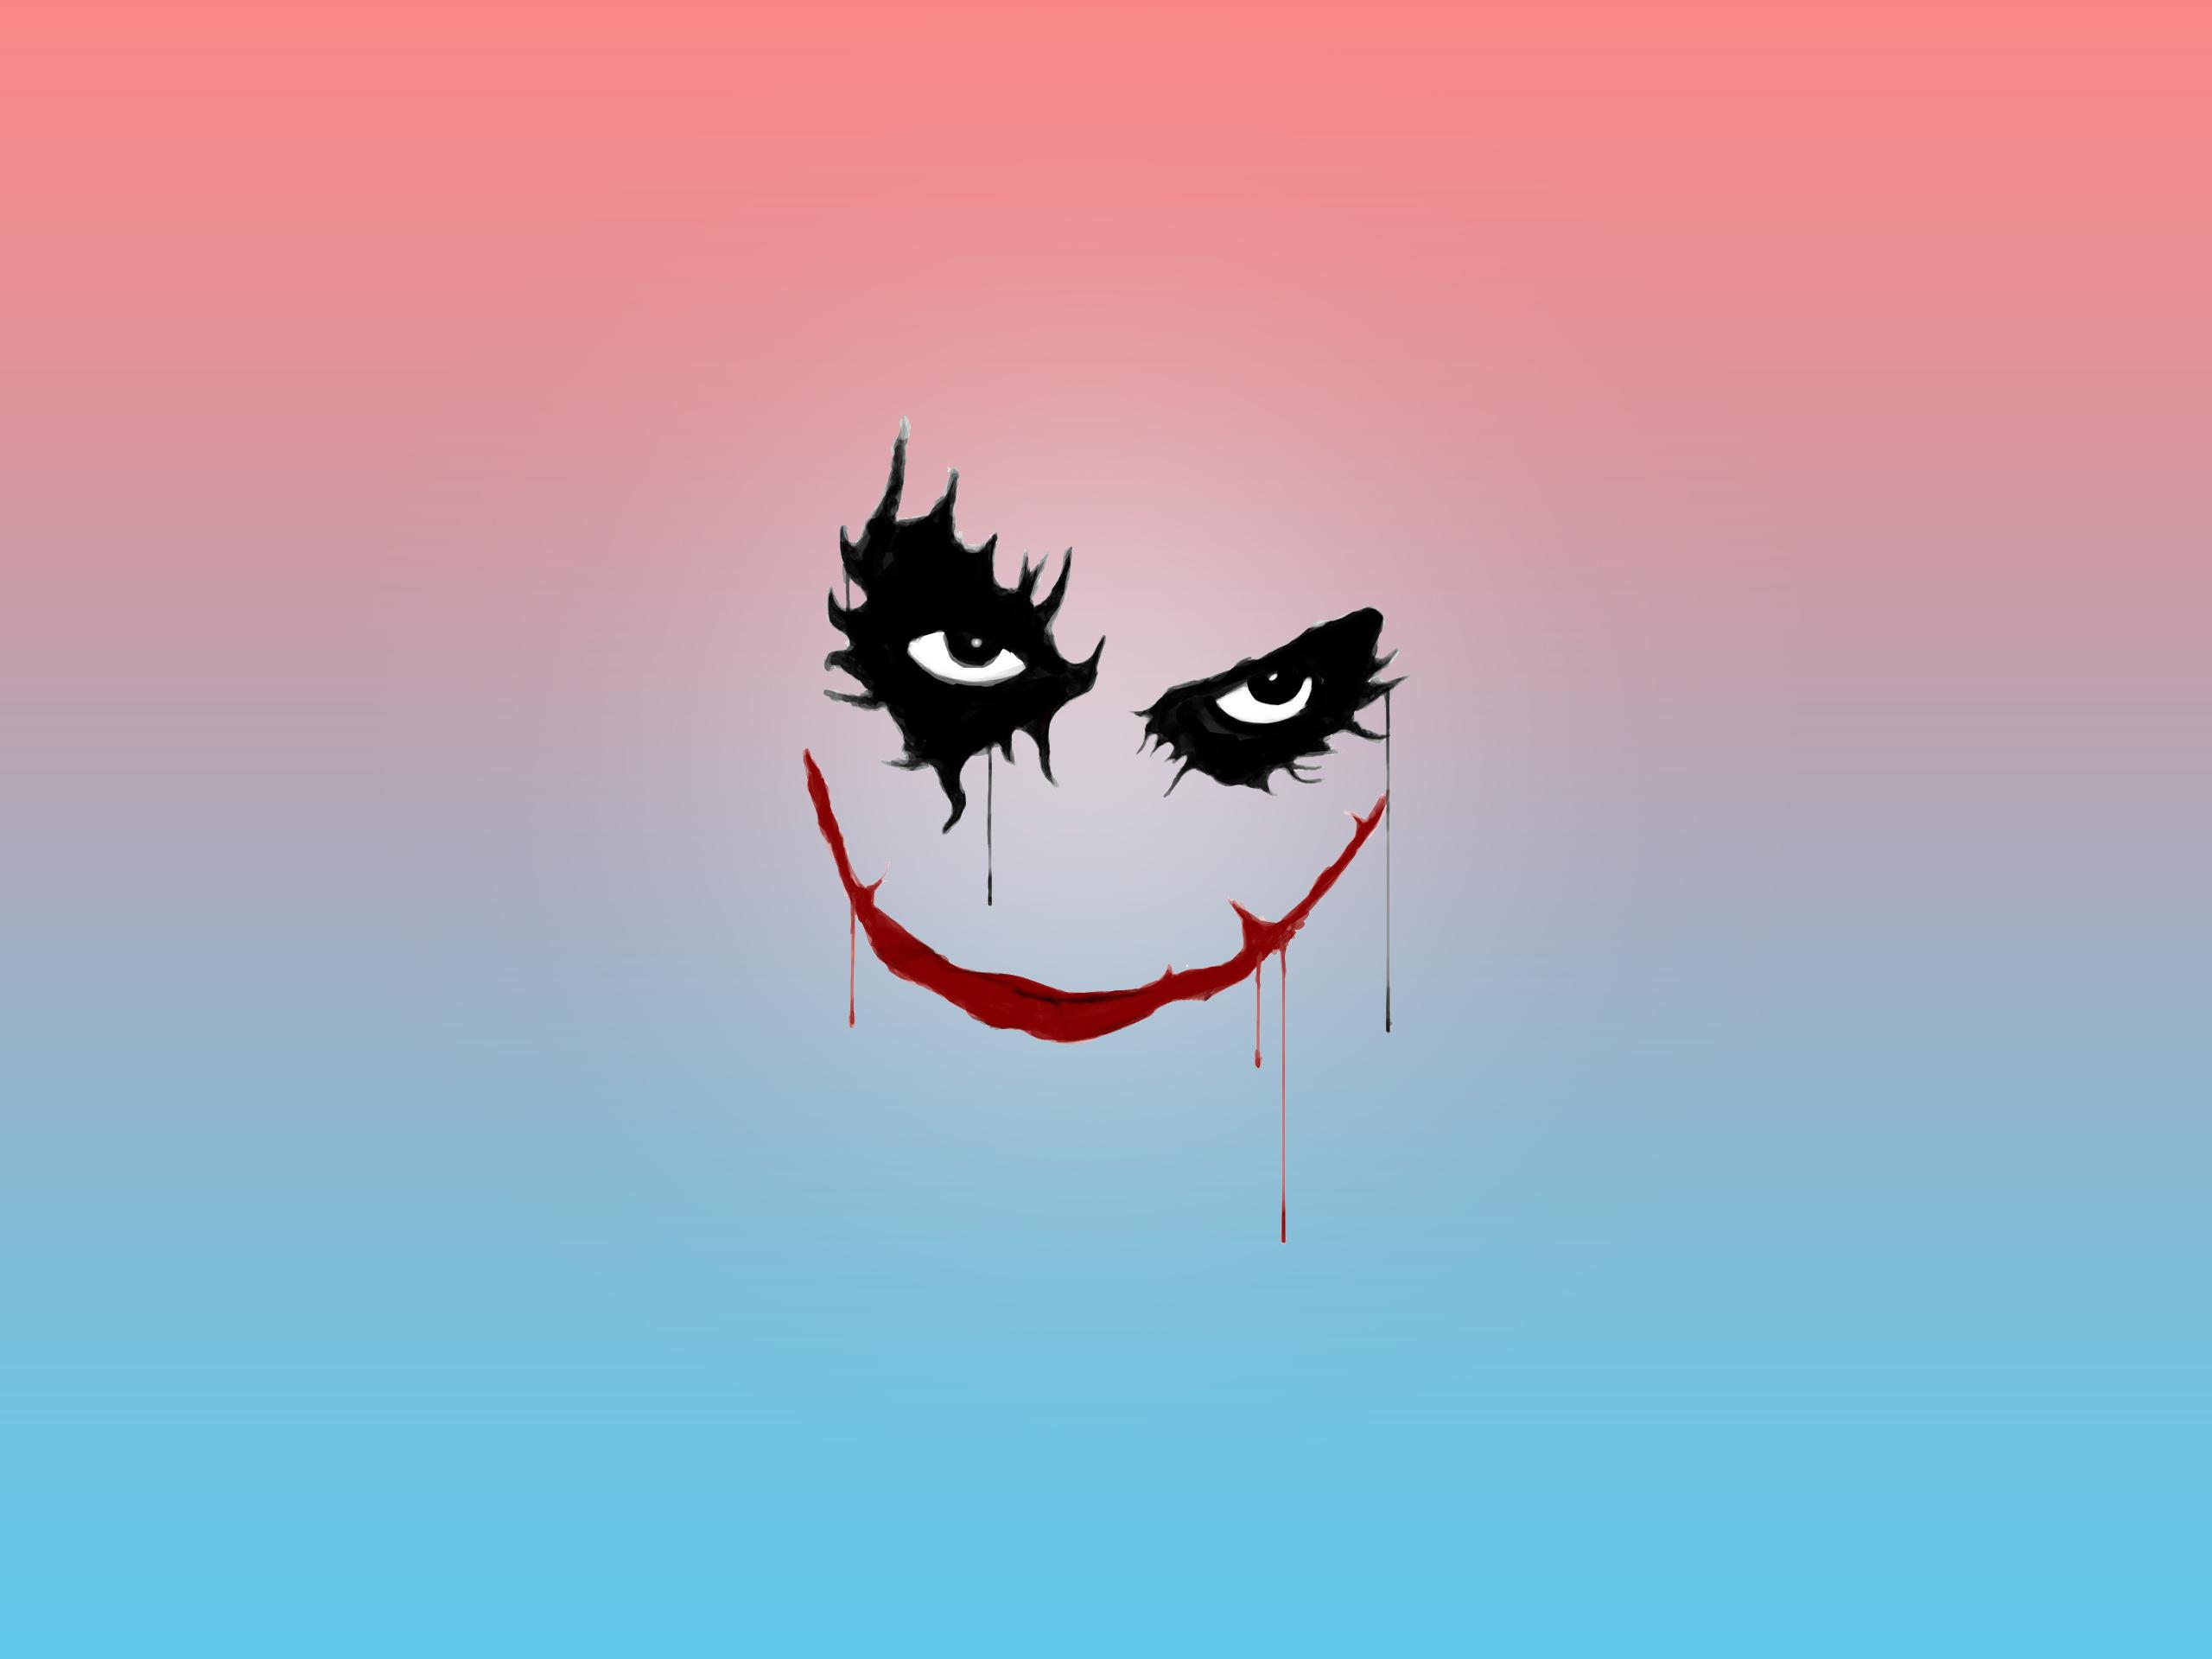 joker wallpaper iphone by folicorow16 on deviantart